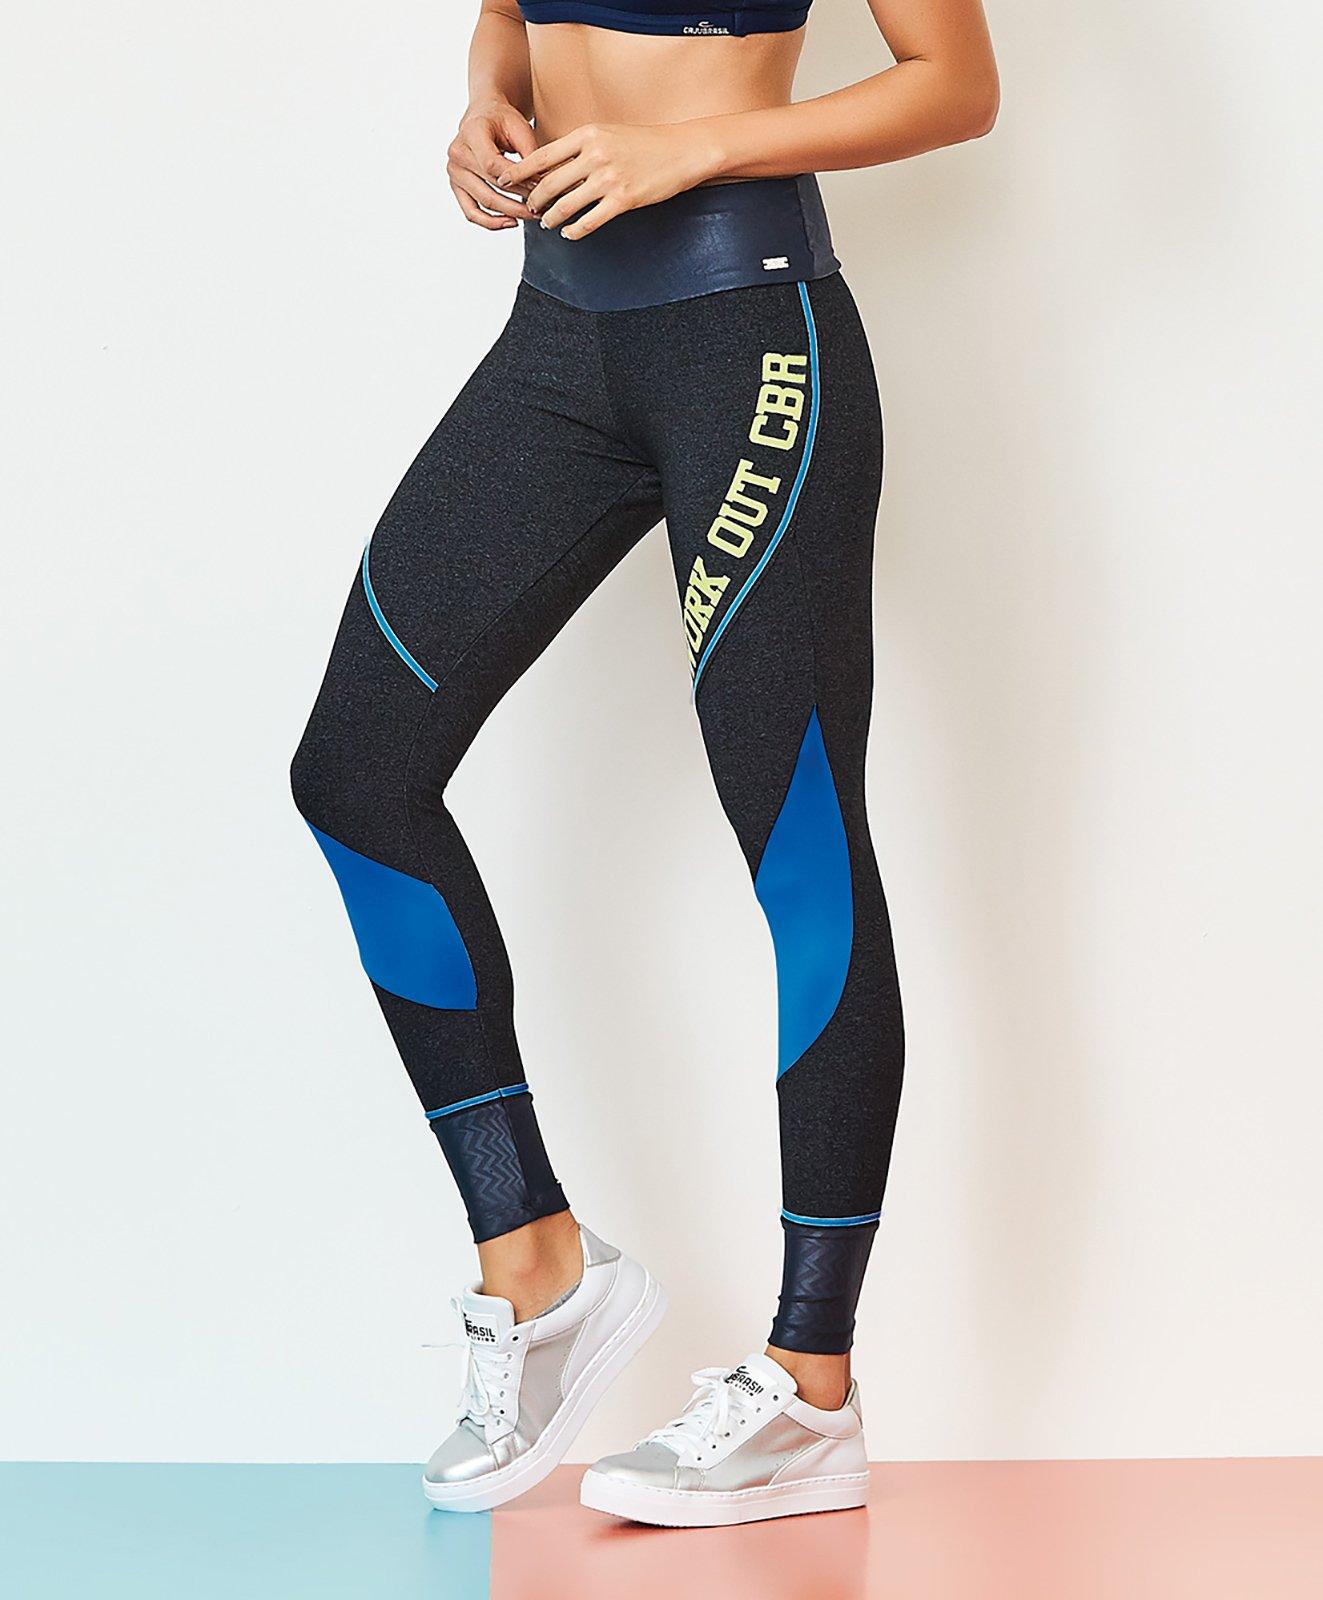 Fitness Leggings Material: Fitness-leggings, Blau, Bi-material Mit Aufschrift